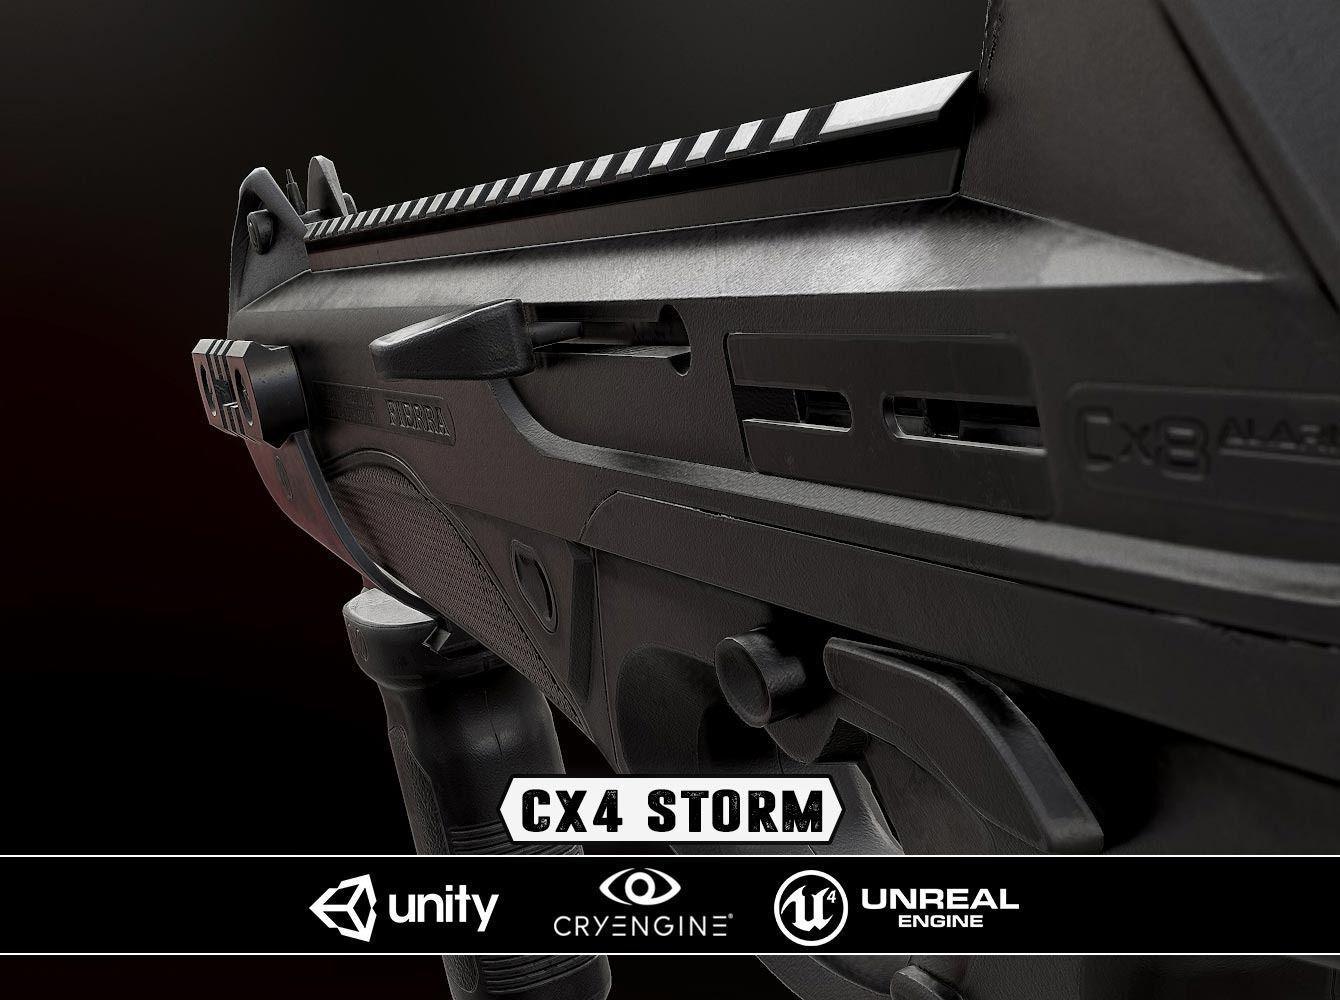 CX4 Storm - Model and Textures